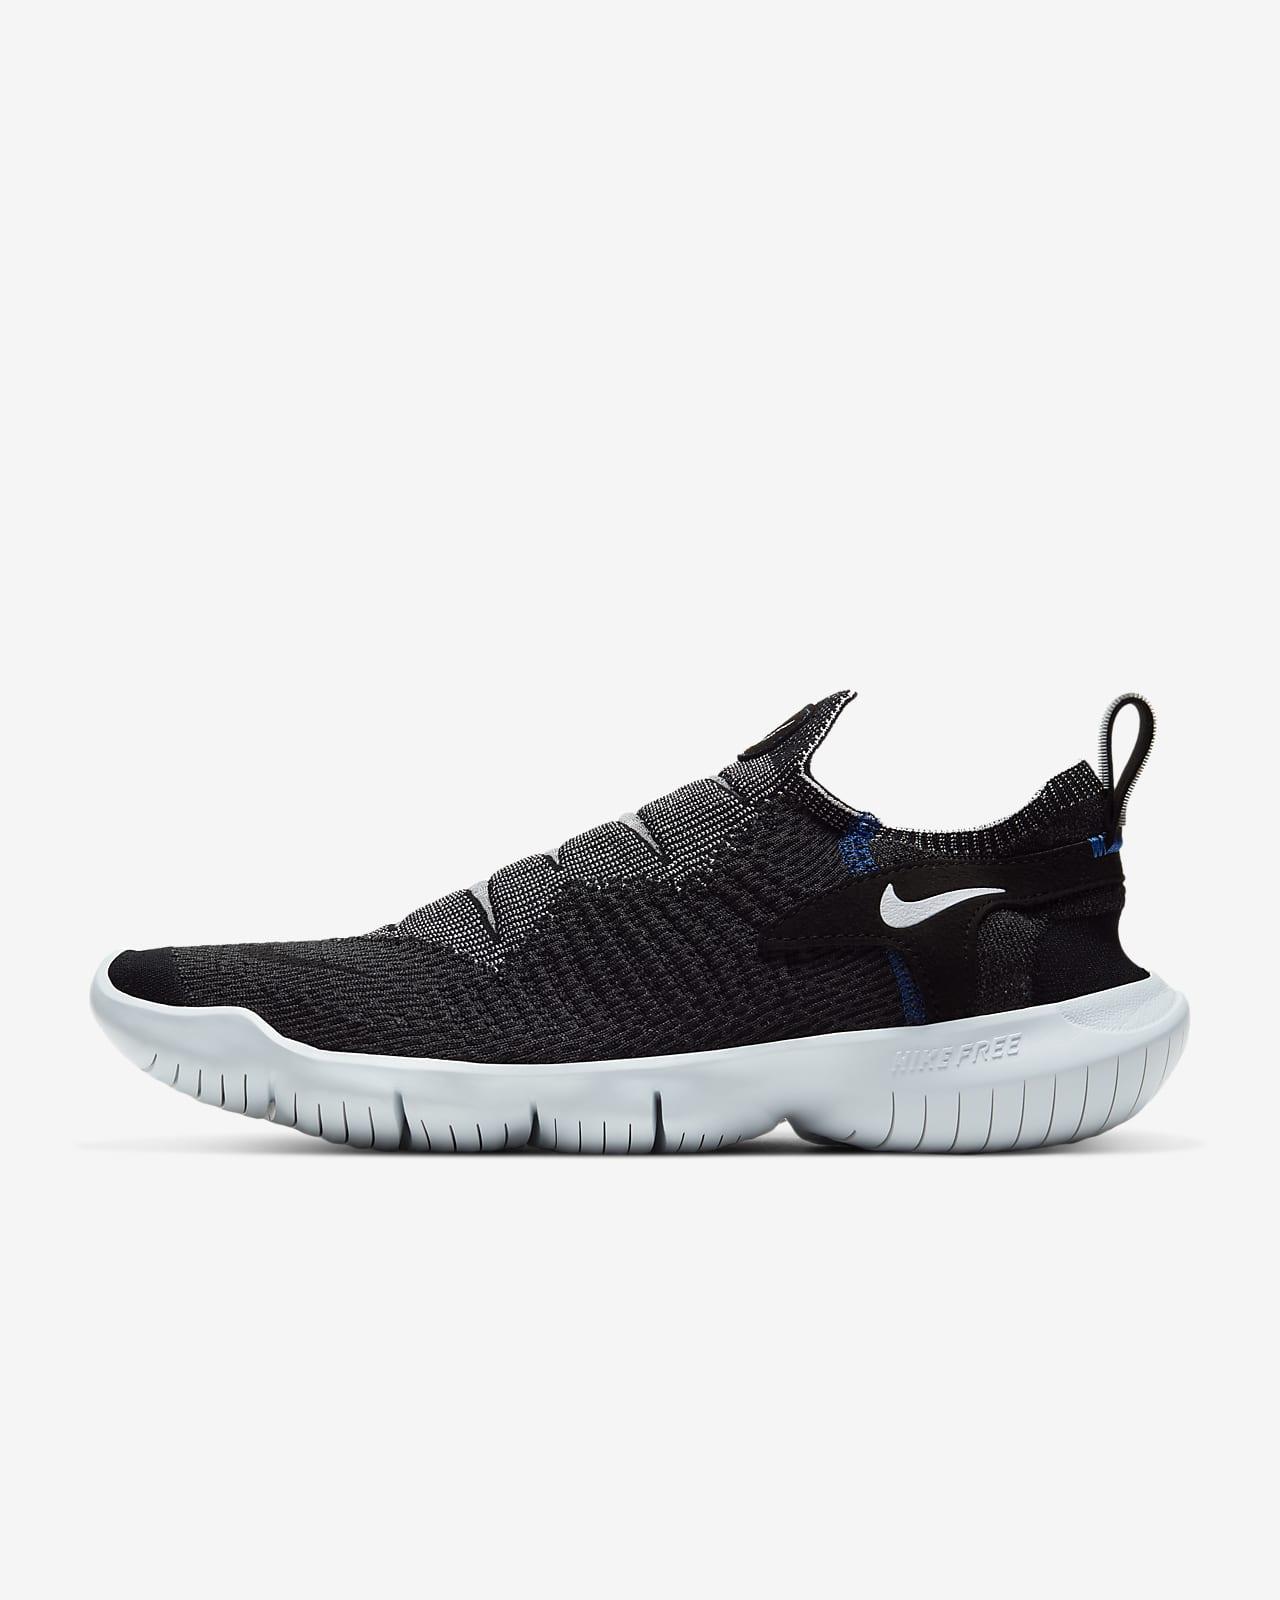 Nike Free RN Flyknit 3.0 2020 男子跑步鞋